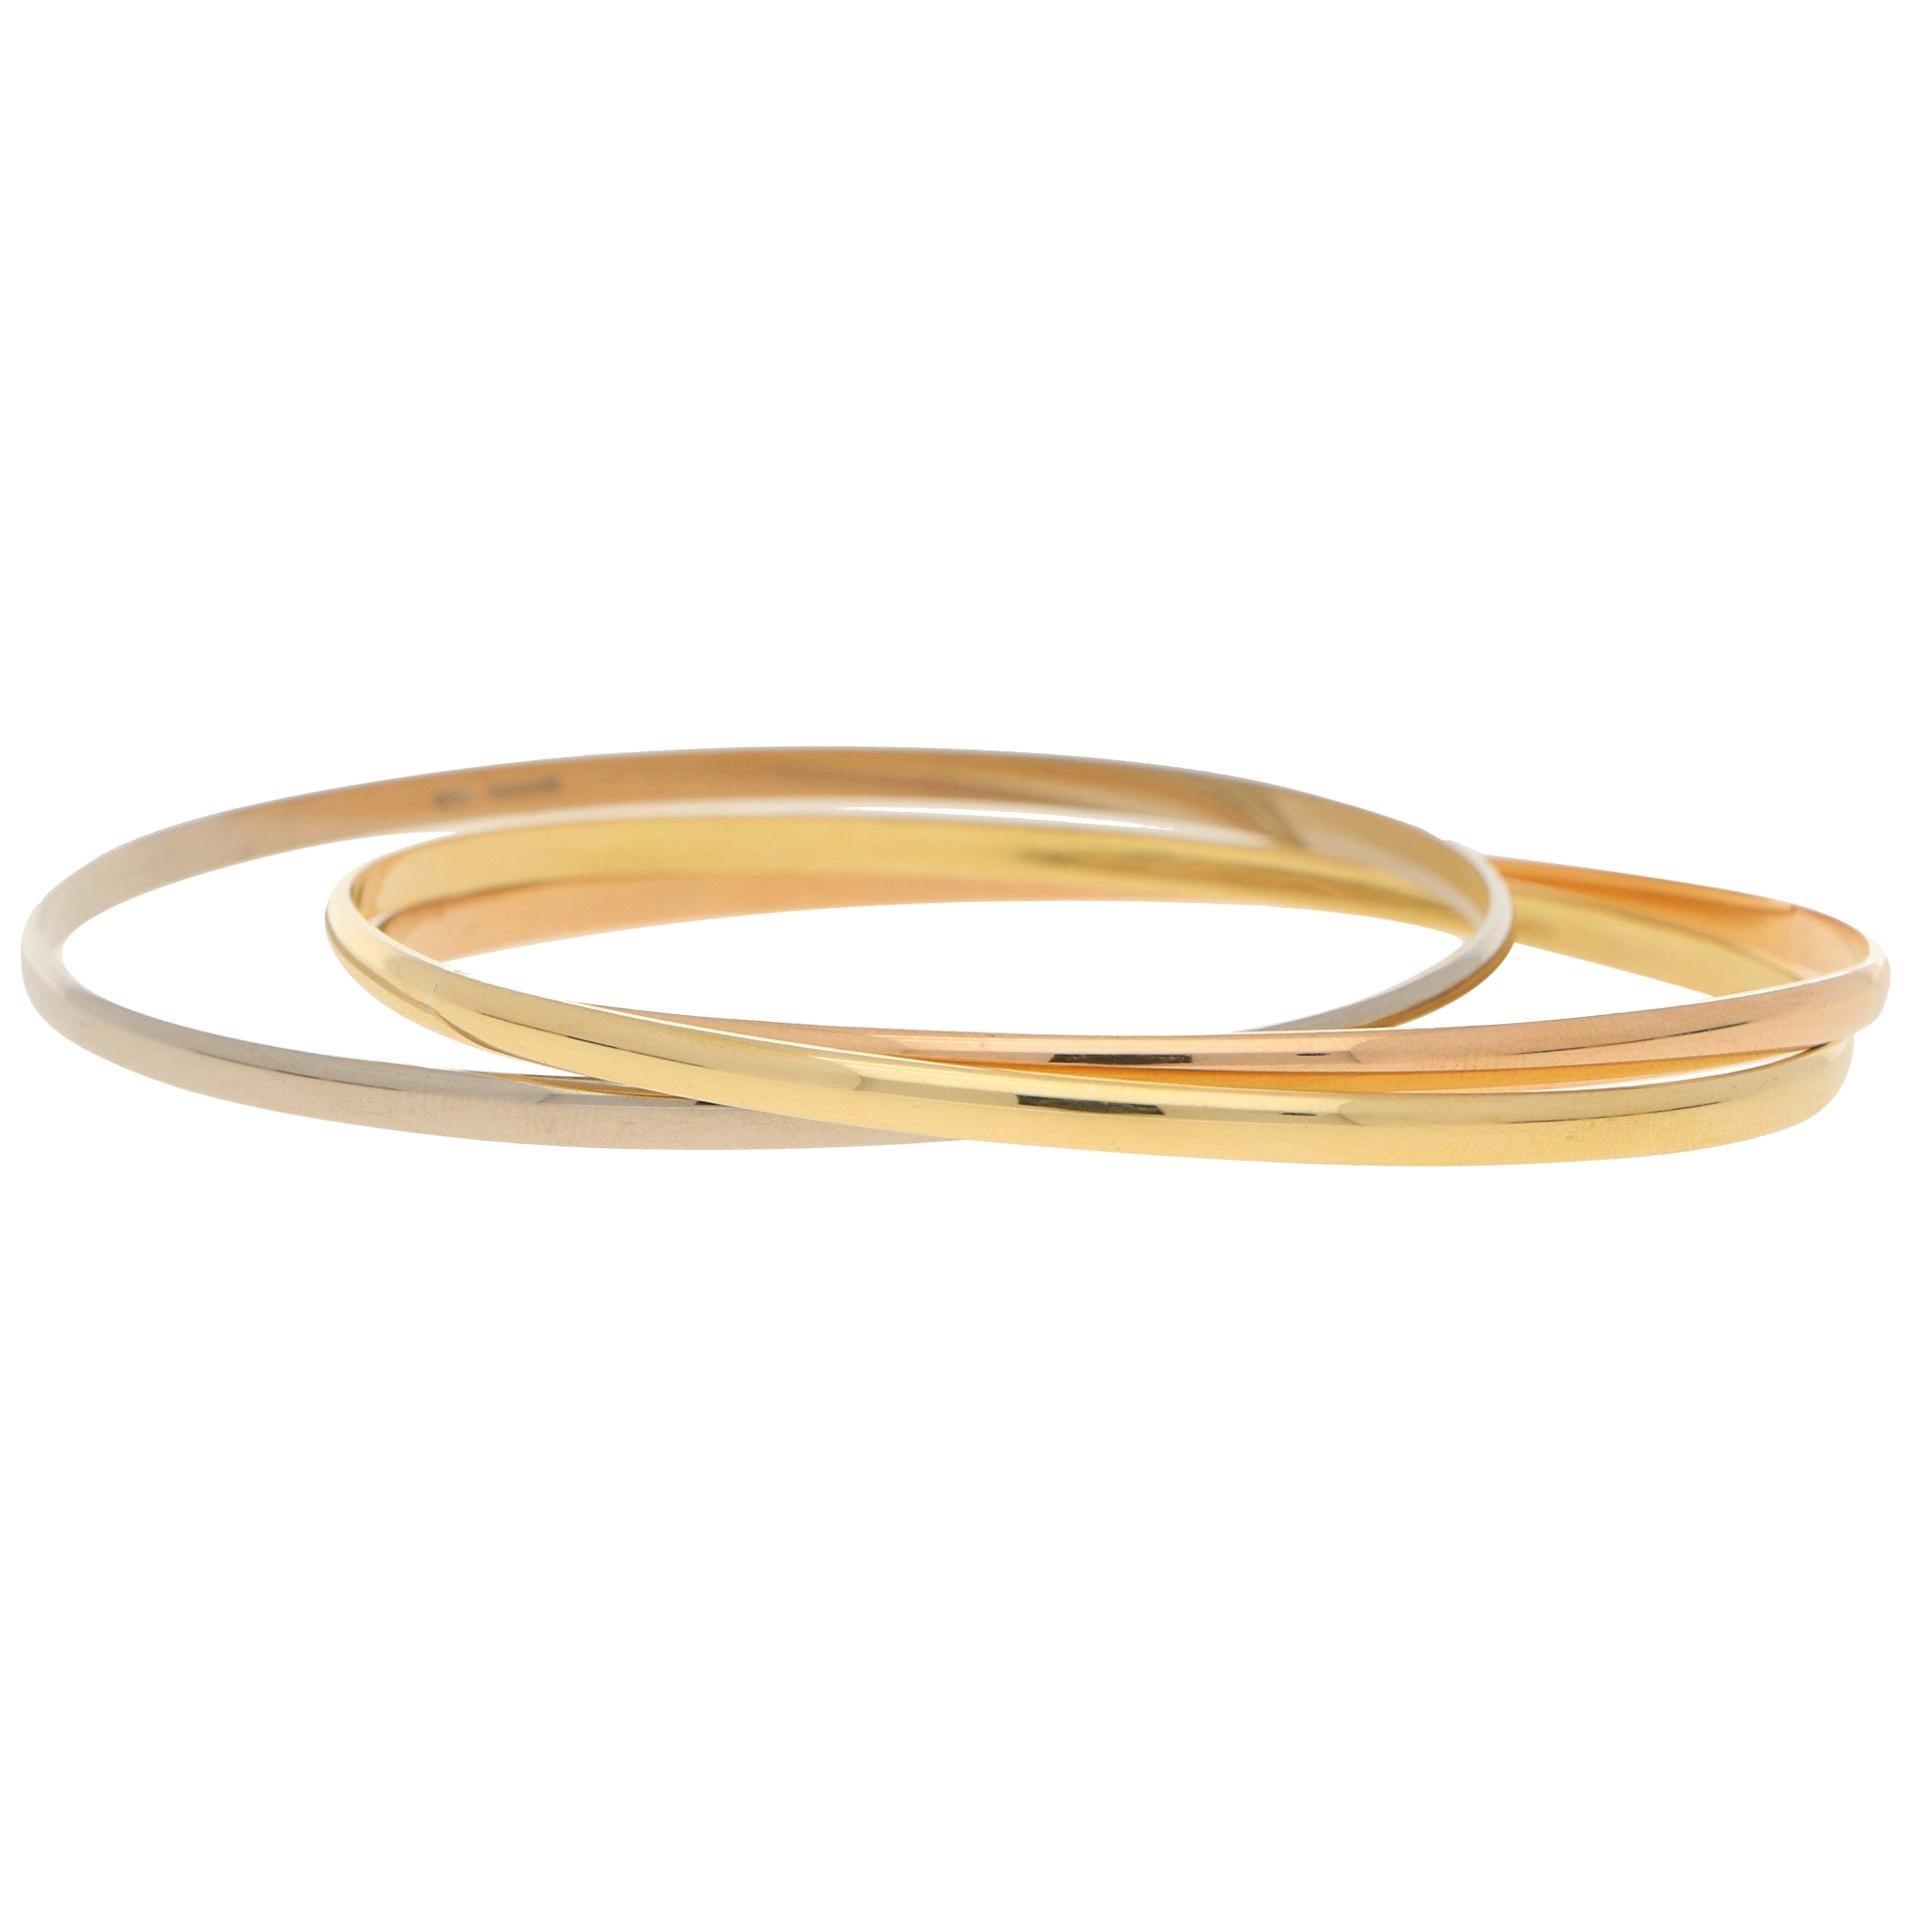 Russian Bangle in Three-Colour 18ct Gold